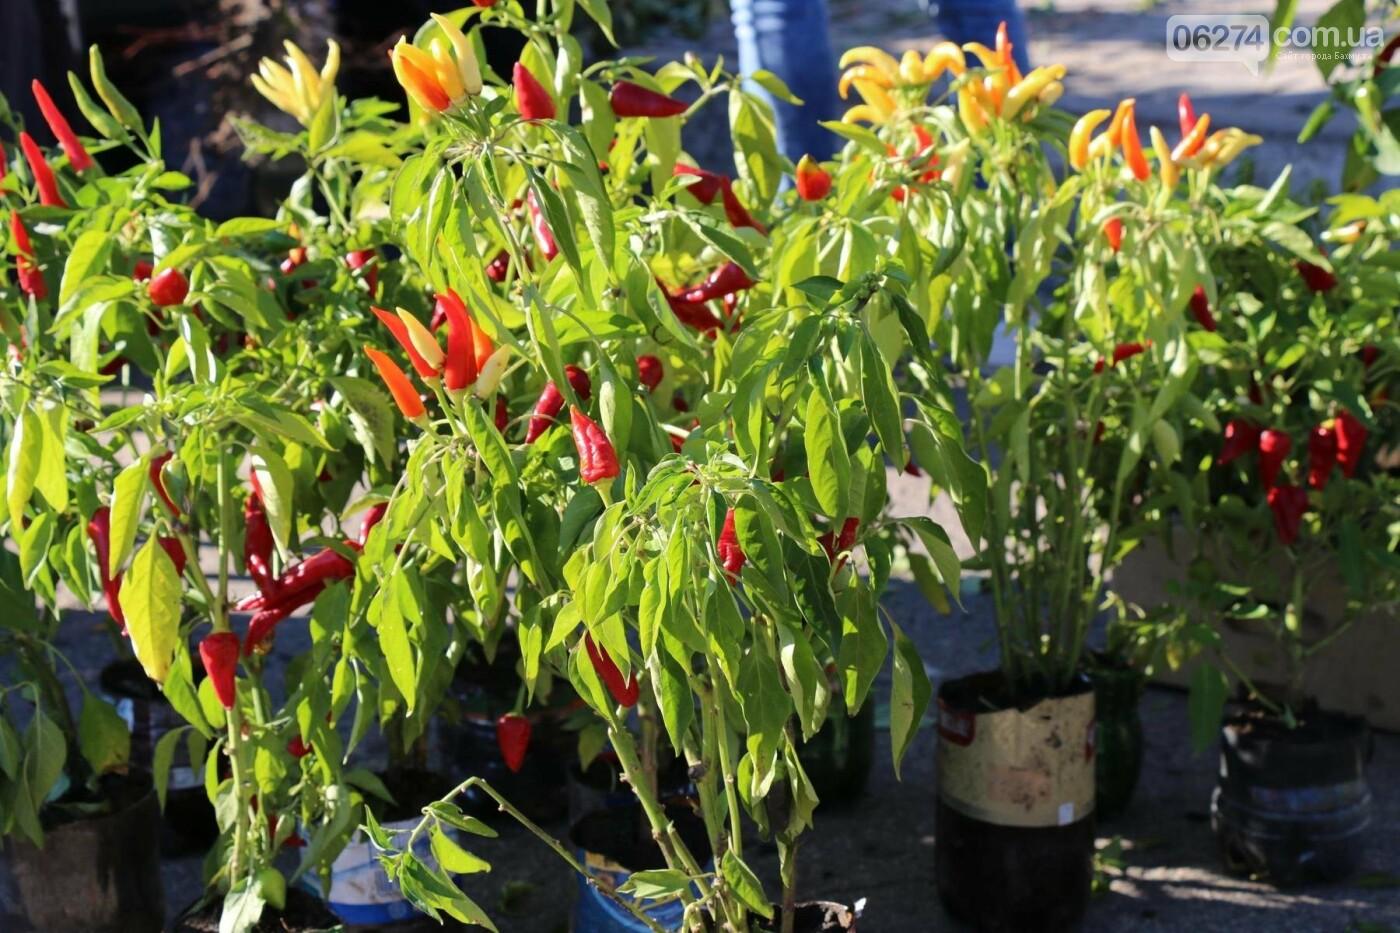 В Бахмуте прошла ярмарка «День садовода» (ФОТО), фото-8